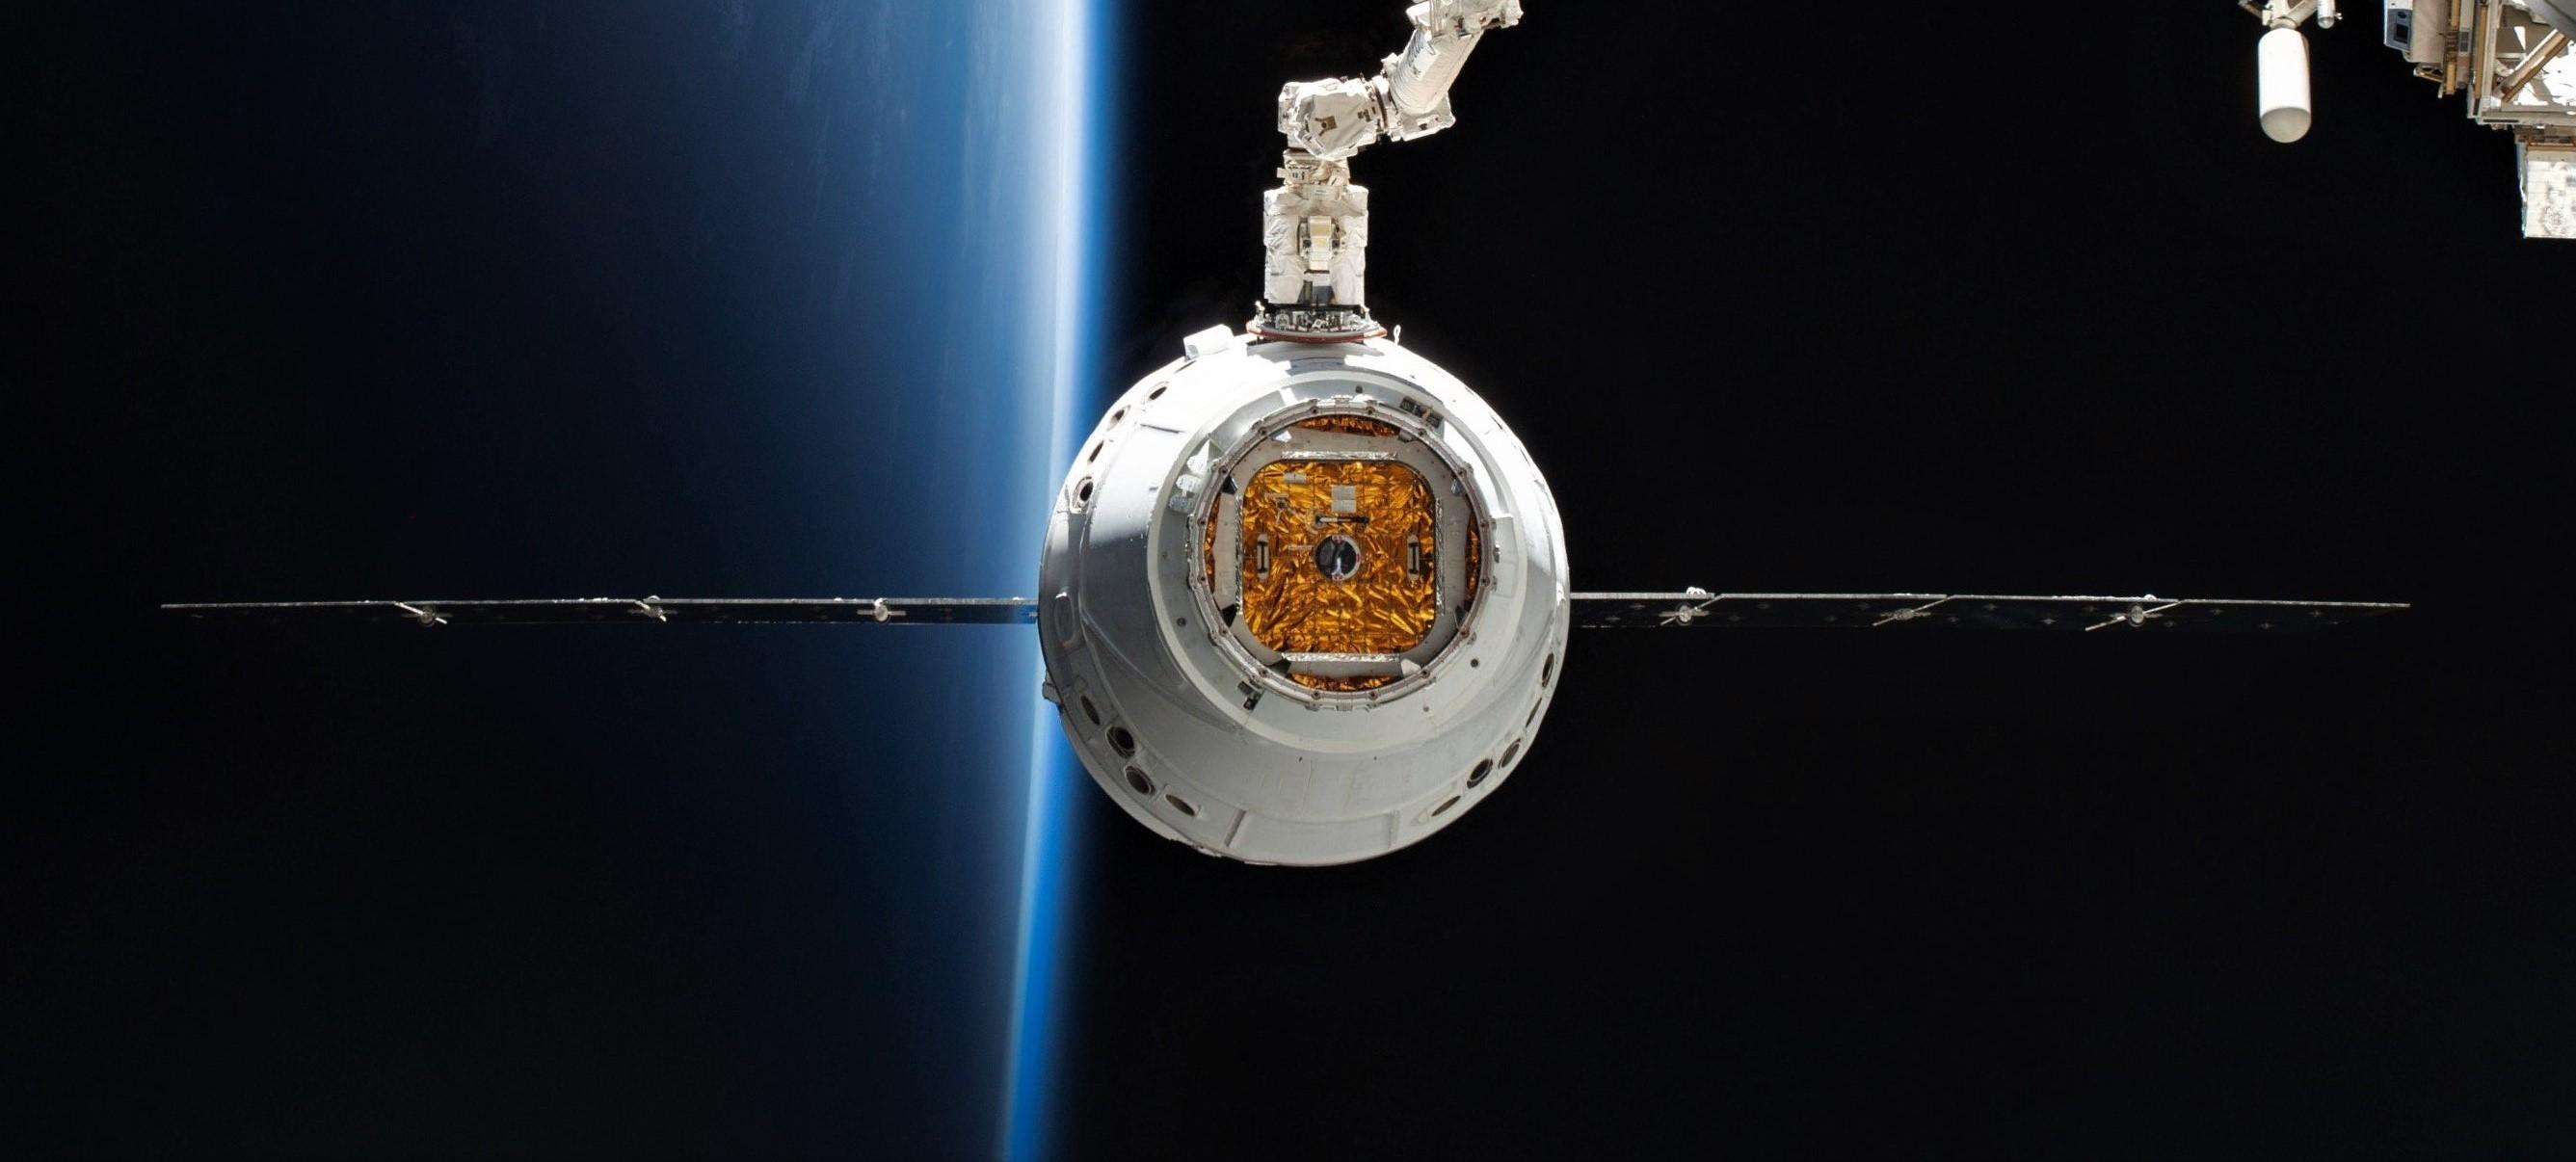 Cargo Dragon C113 CRS-17 ISS arrival 050619 (NASA – Nick Hague) 1 crop 2